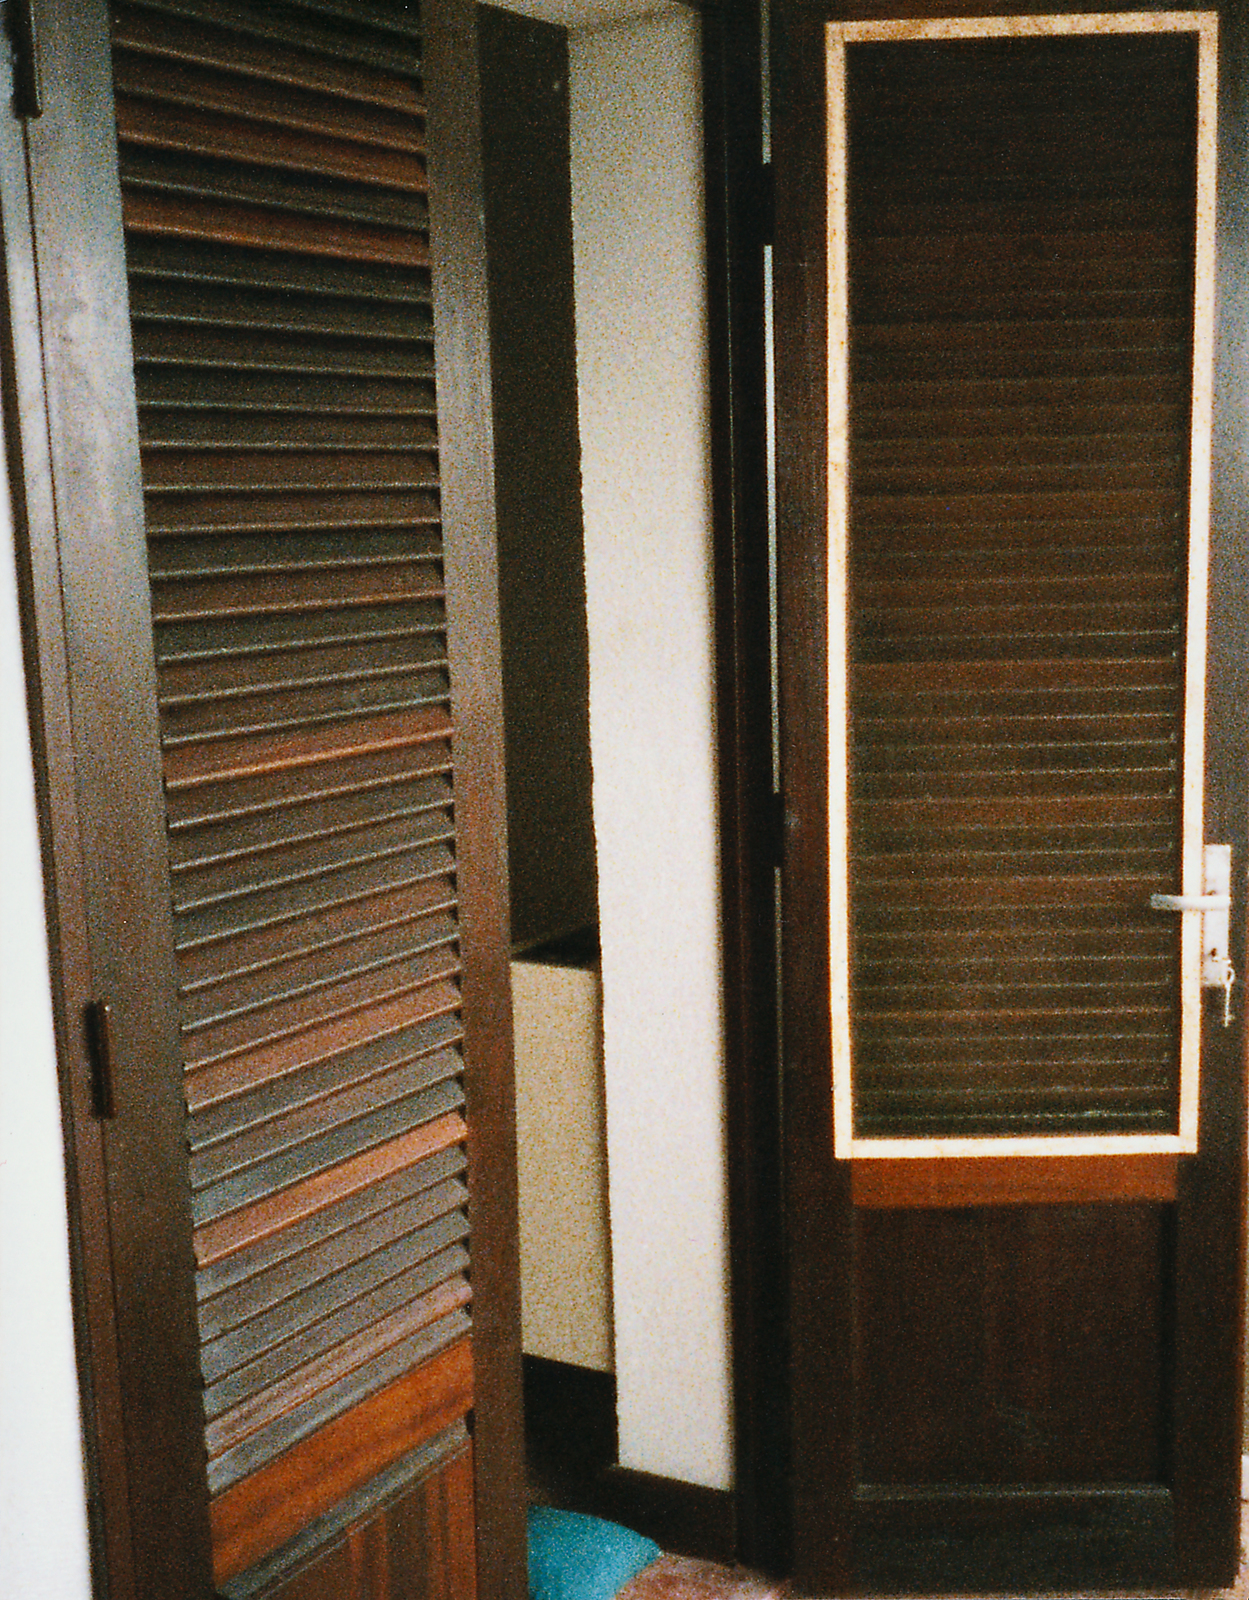 Moroni - Standard Level Position Residence - 1986